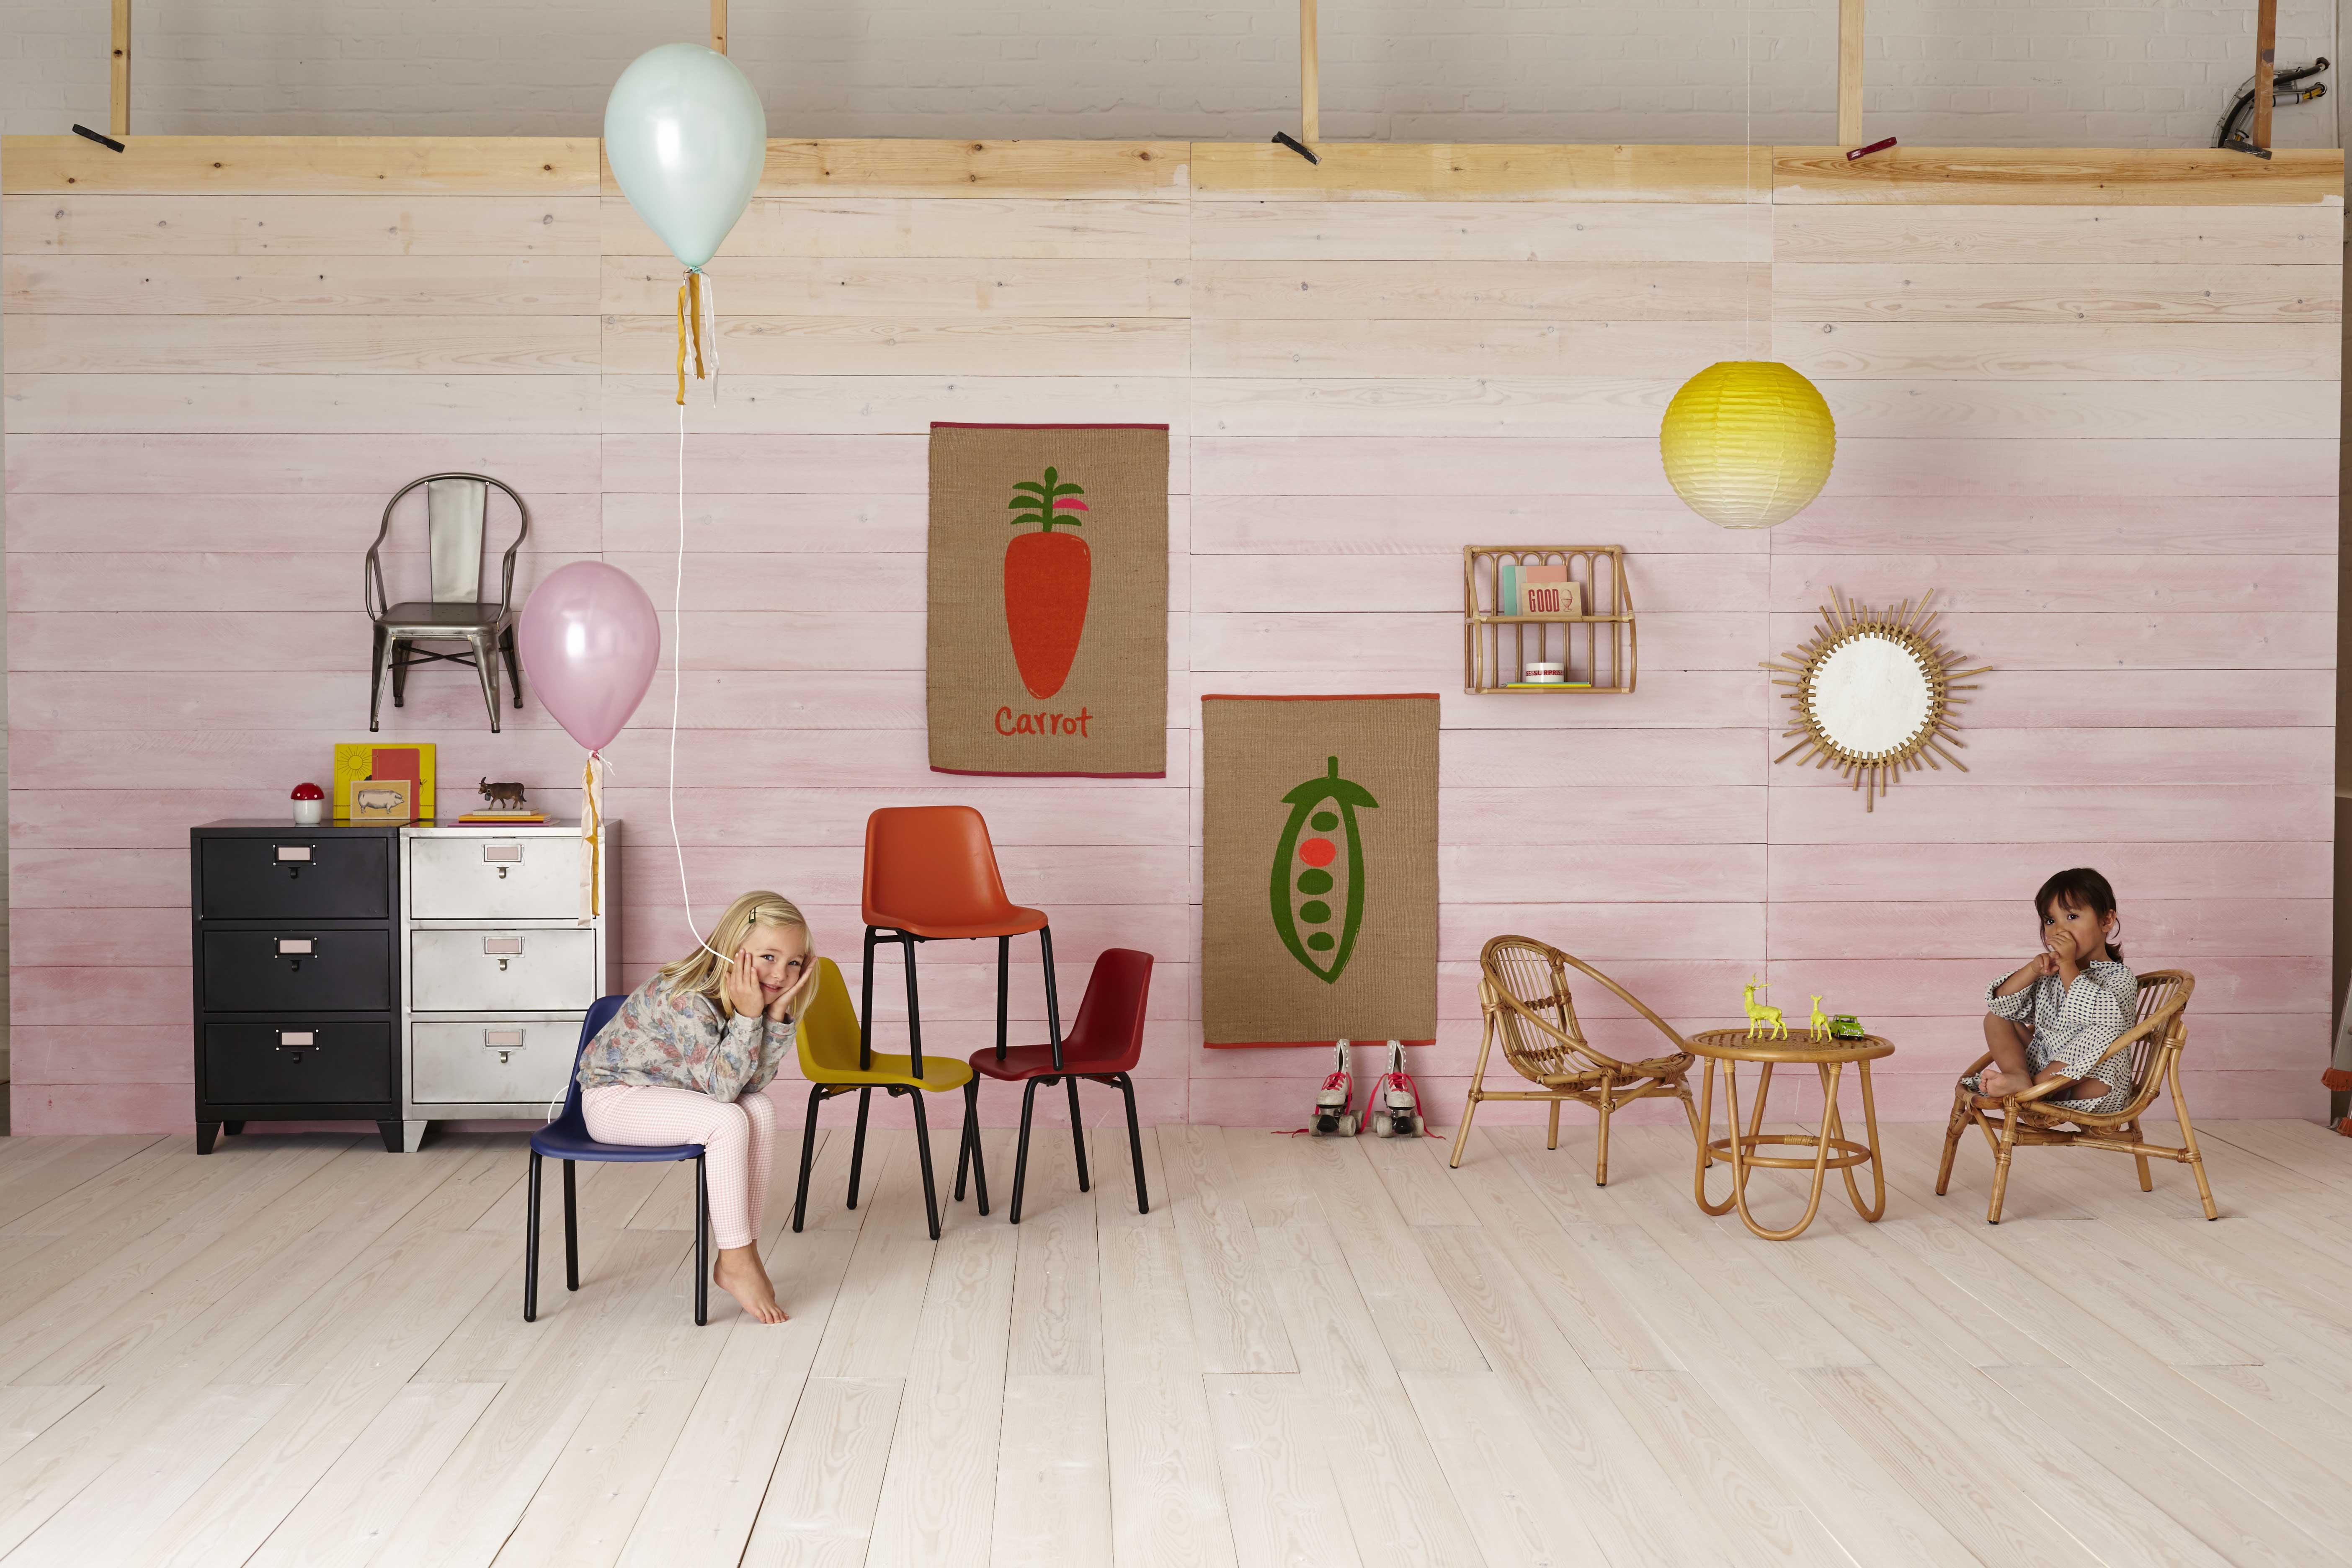 ampm bureau enfant cool bureau enfant vintage en bois with ampm bureau enfant free awesome. Black Bedroom Furniture Sets. Home Design Ideas